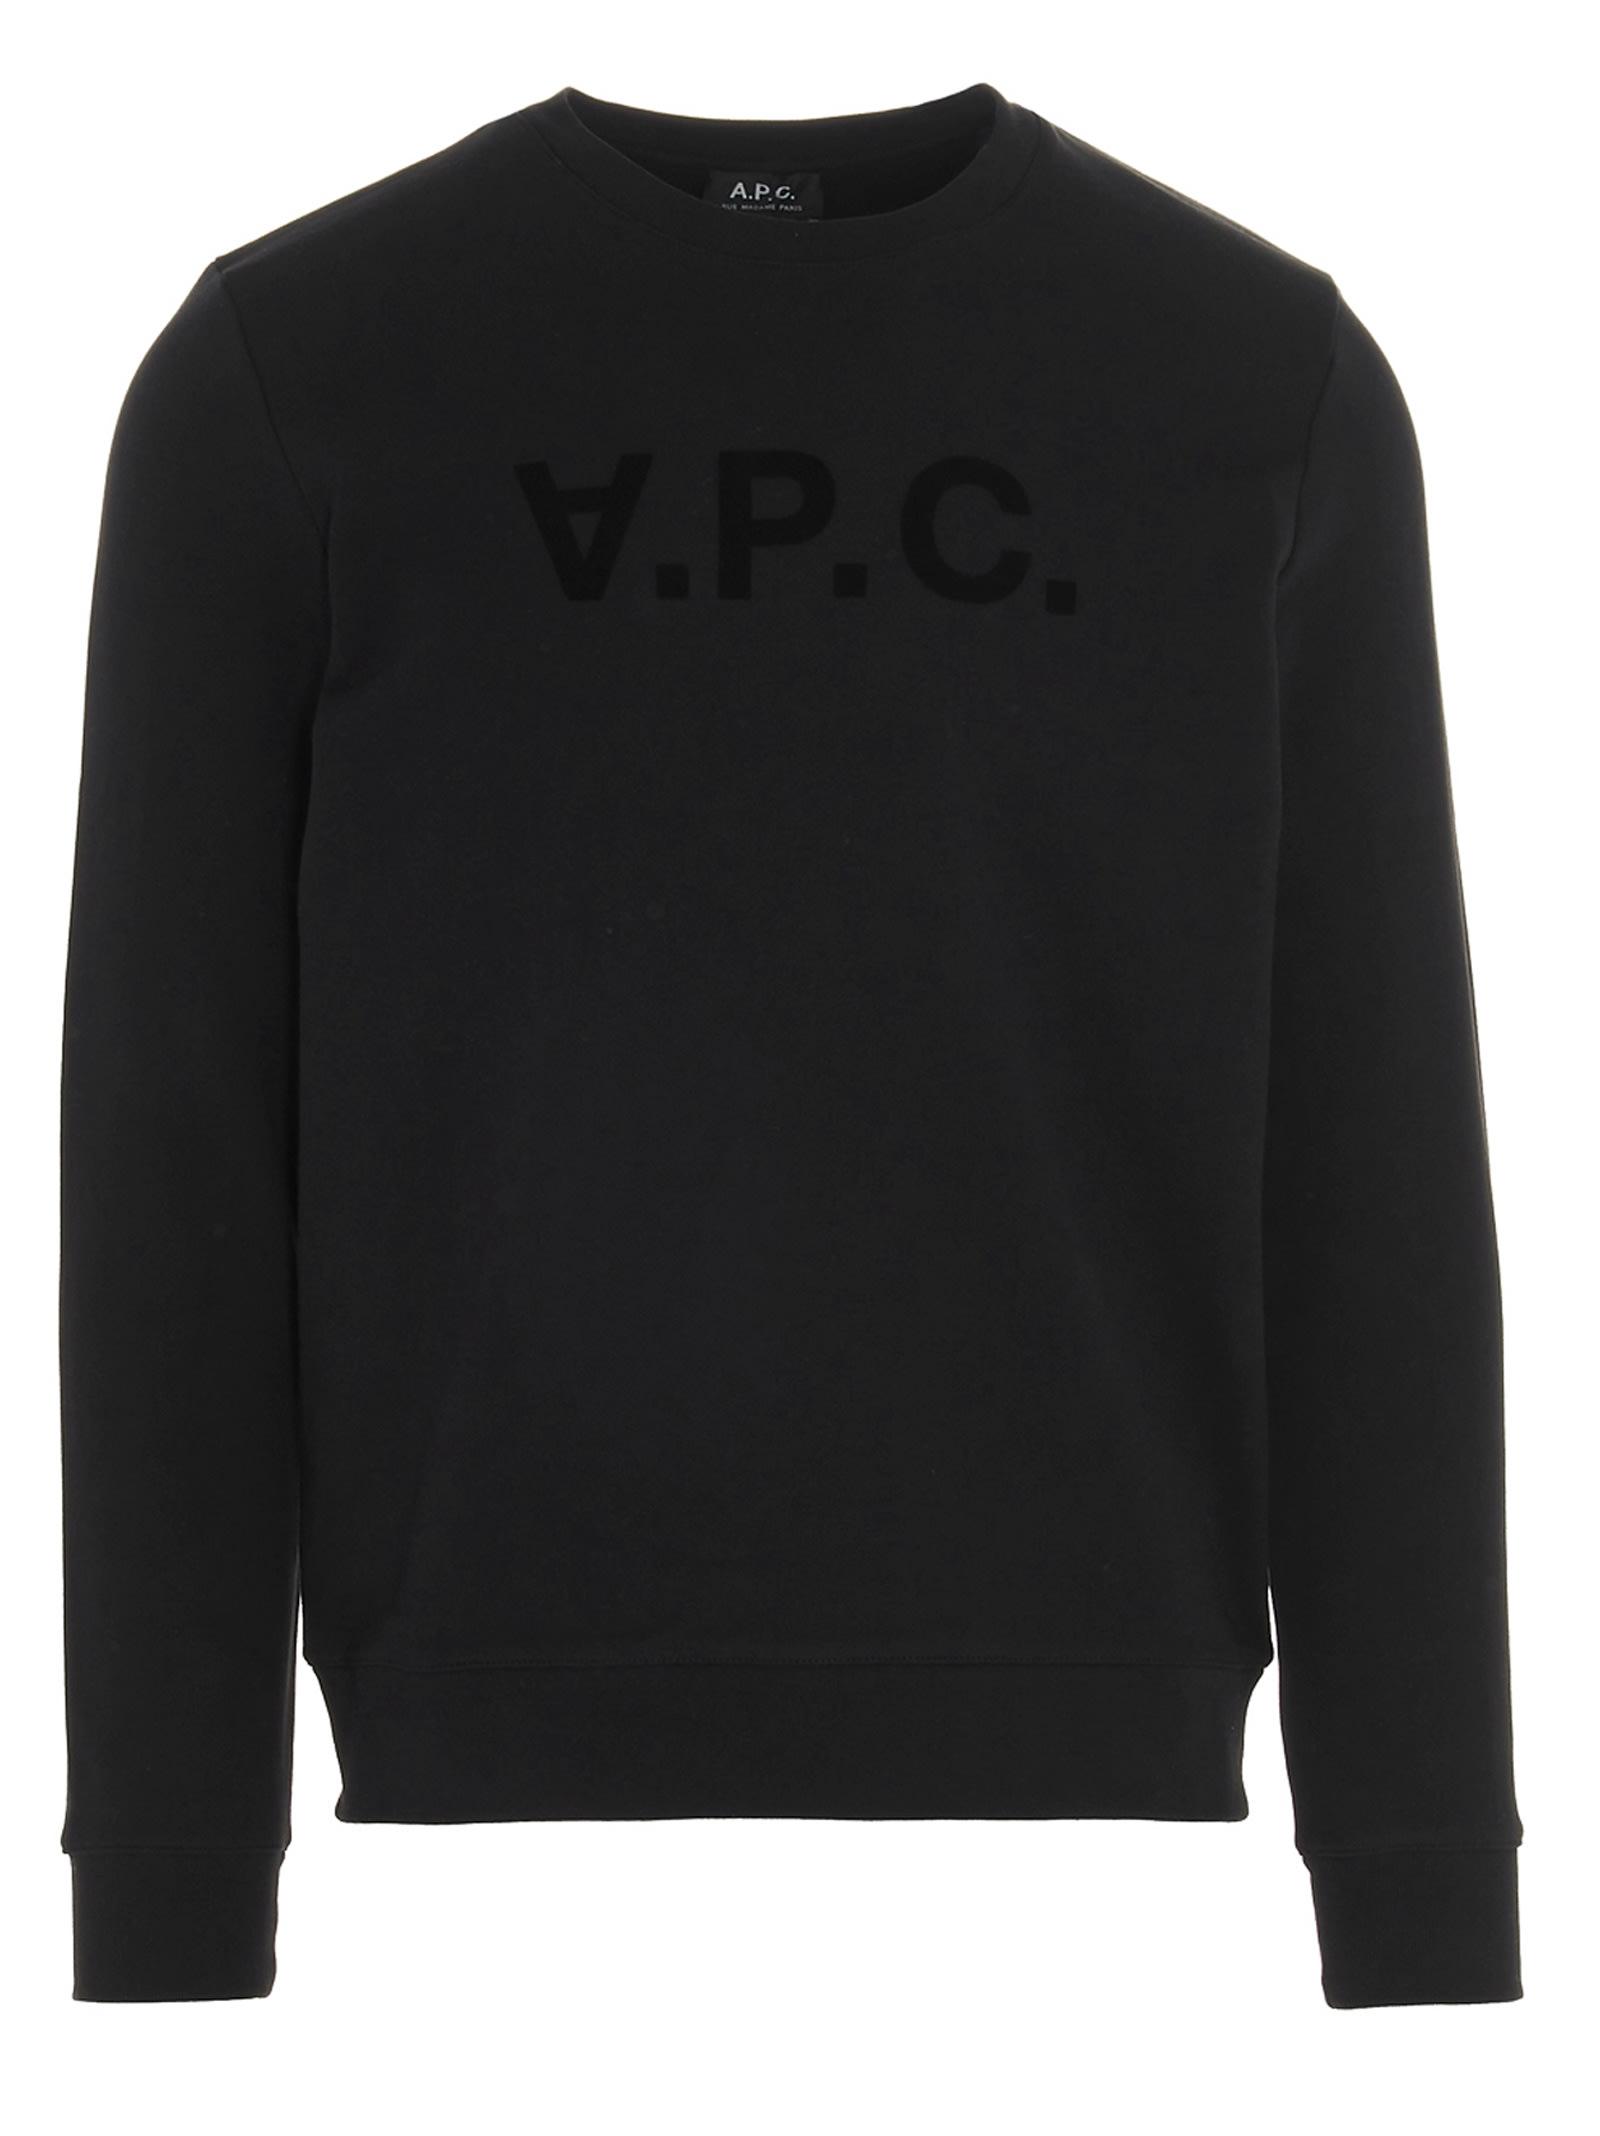 A.p.c. Apc Sweatshirt In Black